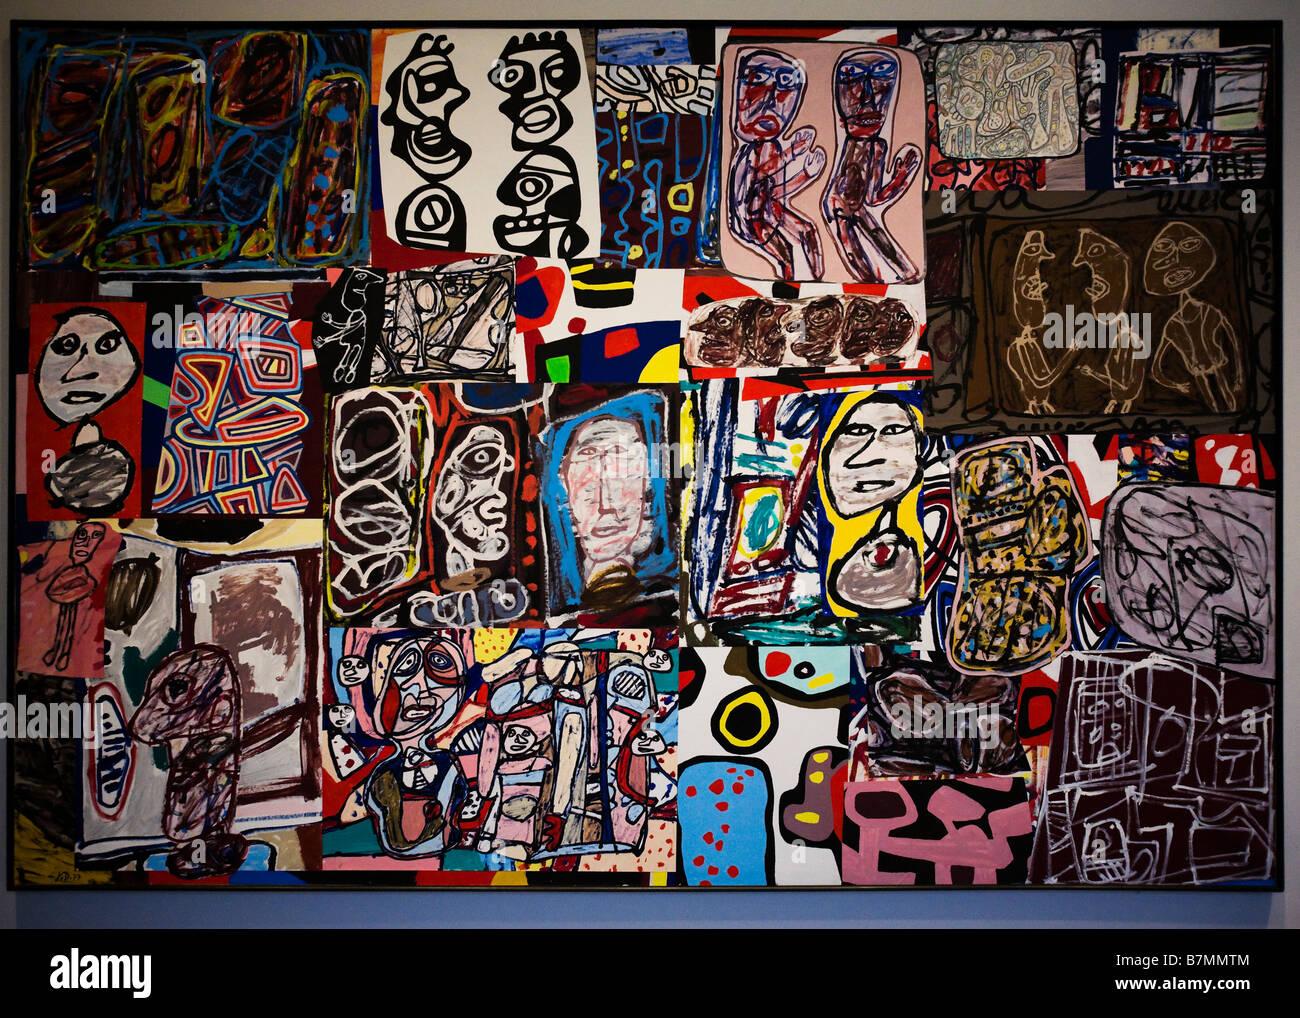 La ronde des images by Jean Dubuffet, 1977 - Stock Image